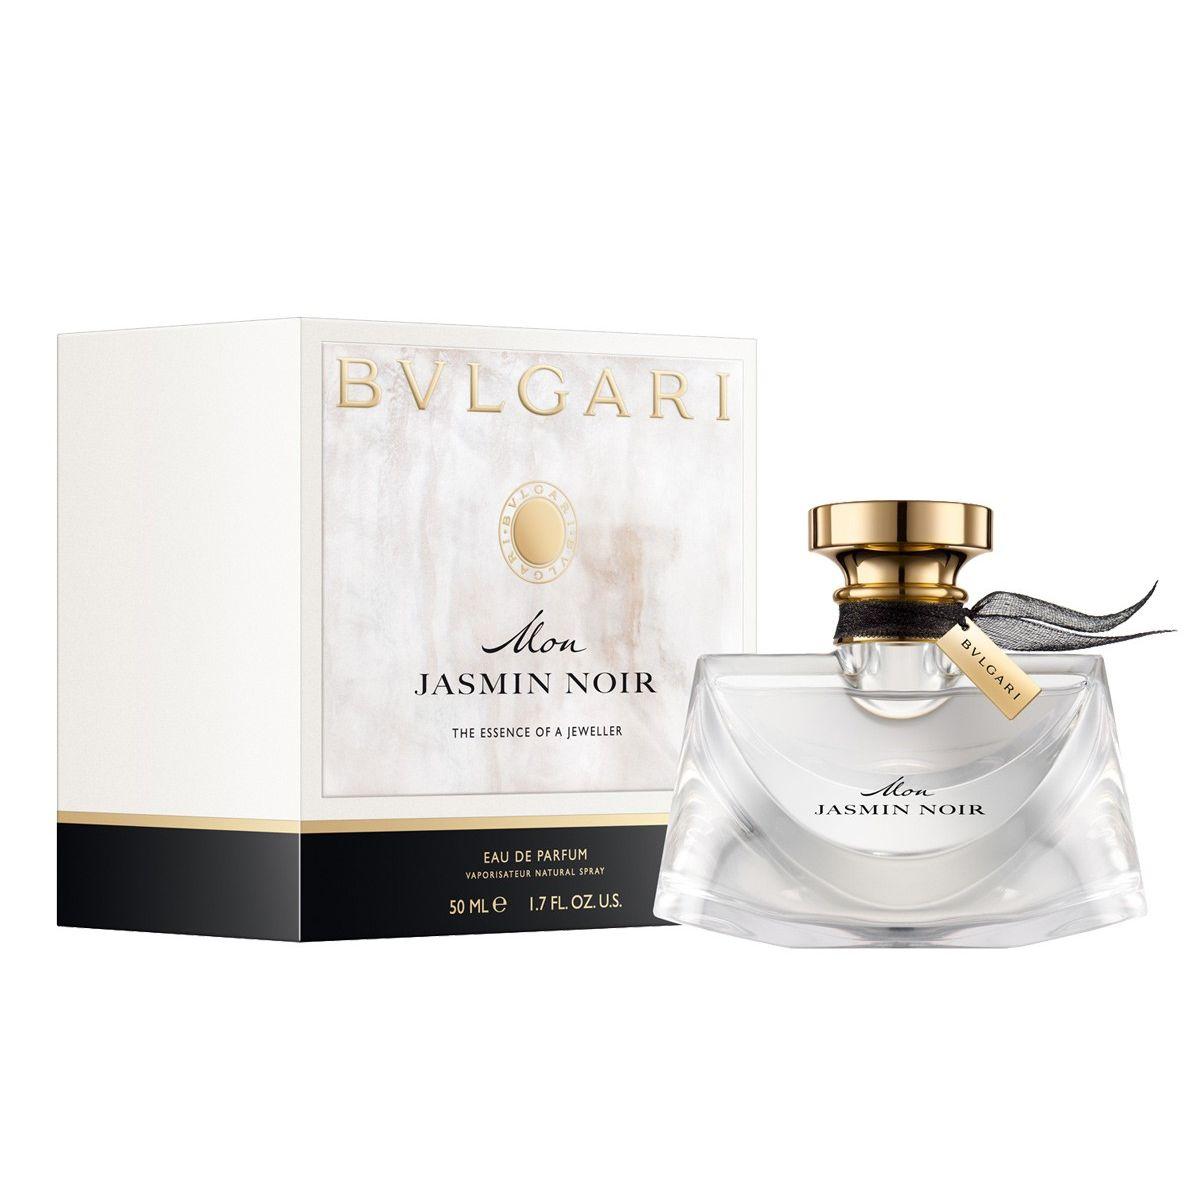 Bvlgari Mon Jasmin Noir Eau de Parfum 50ml Spray